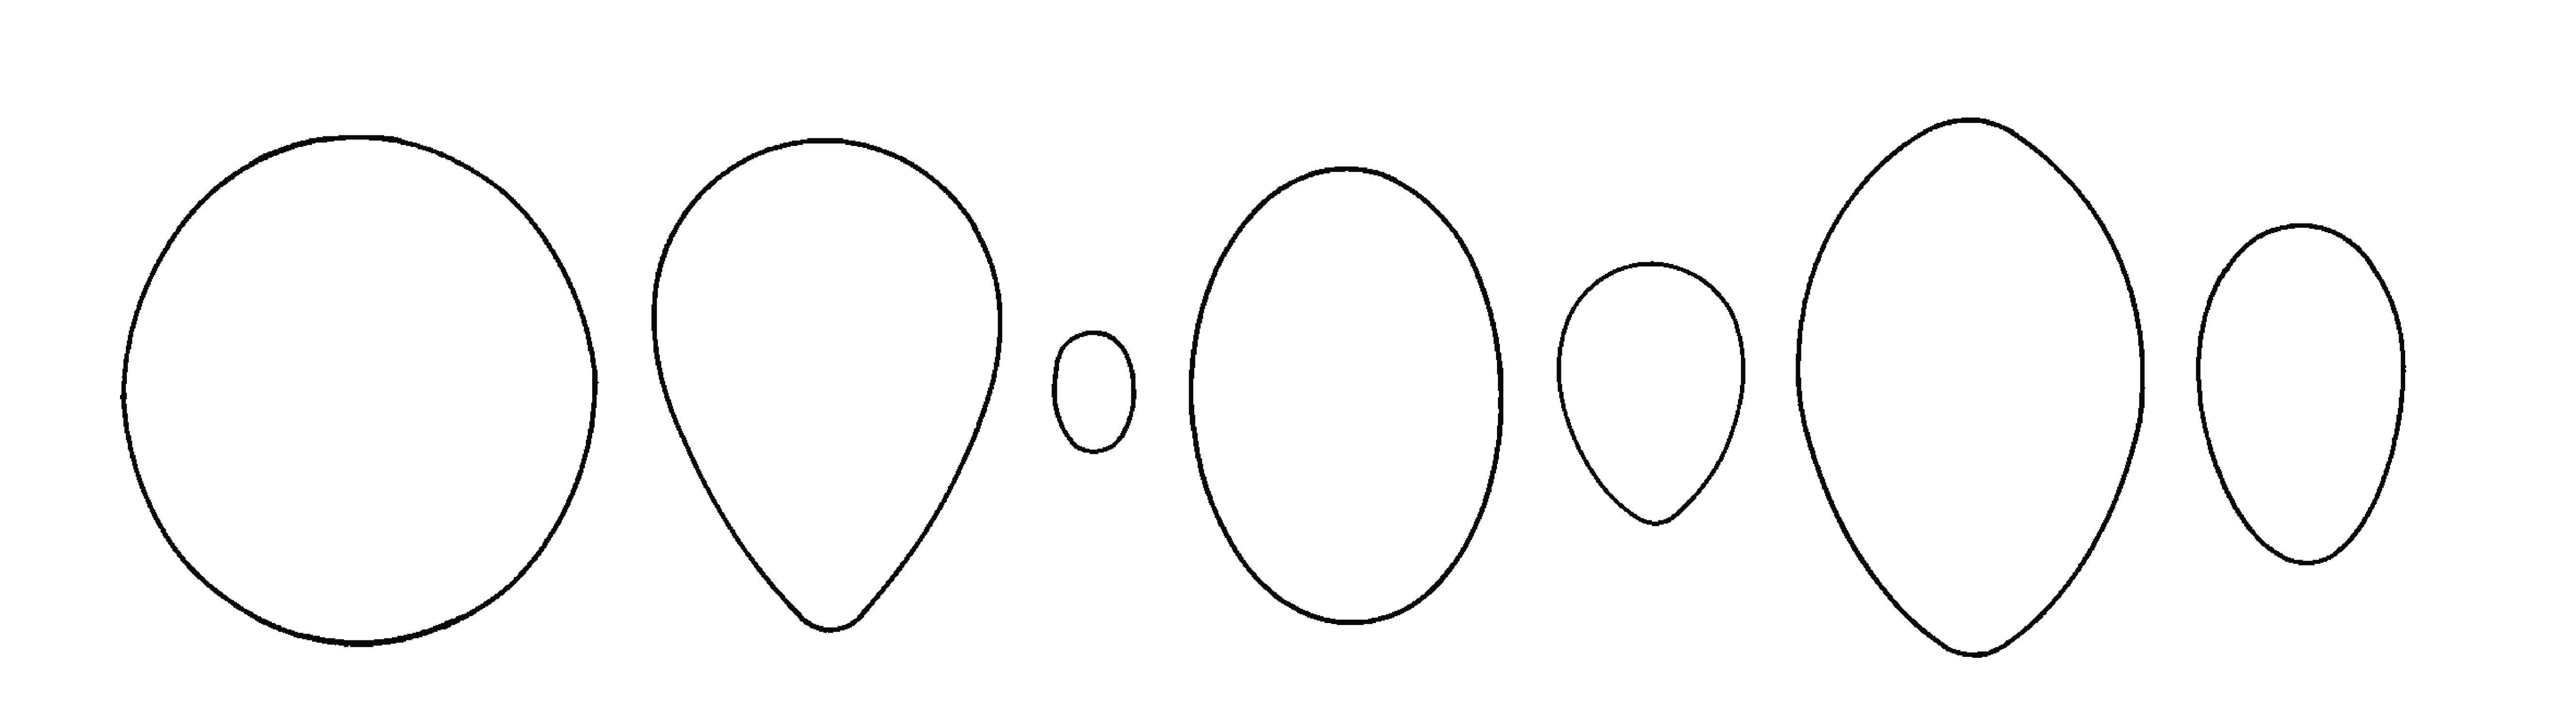 egg image1